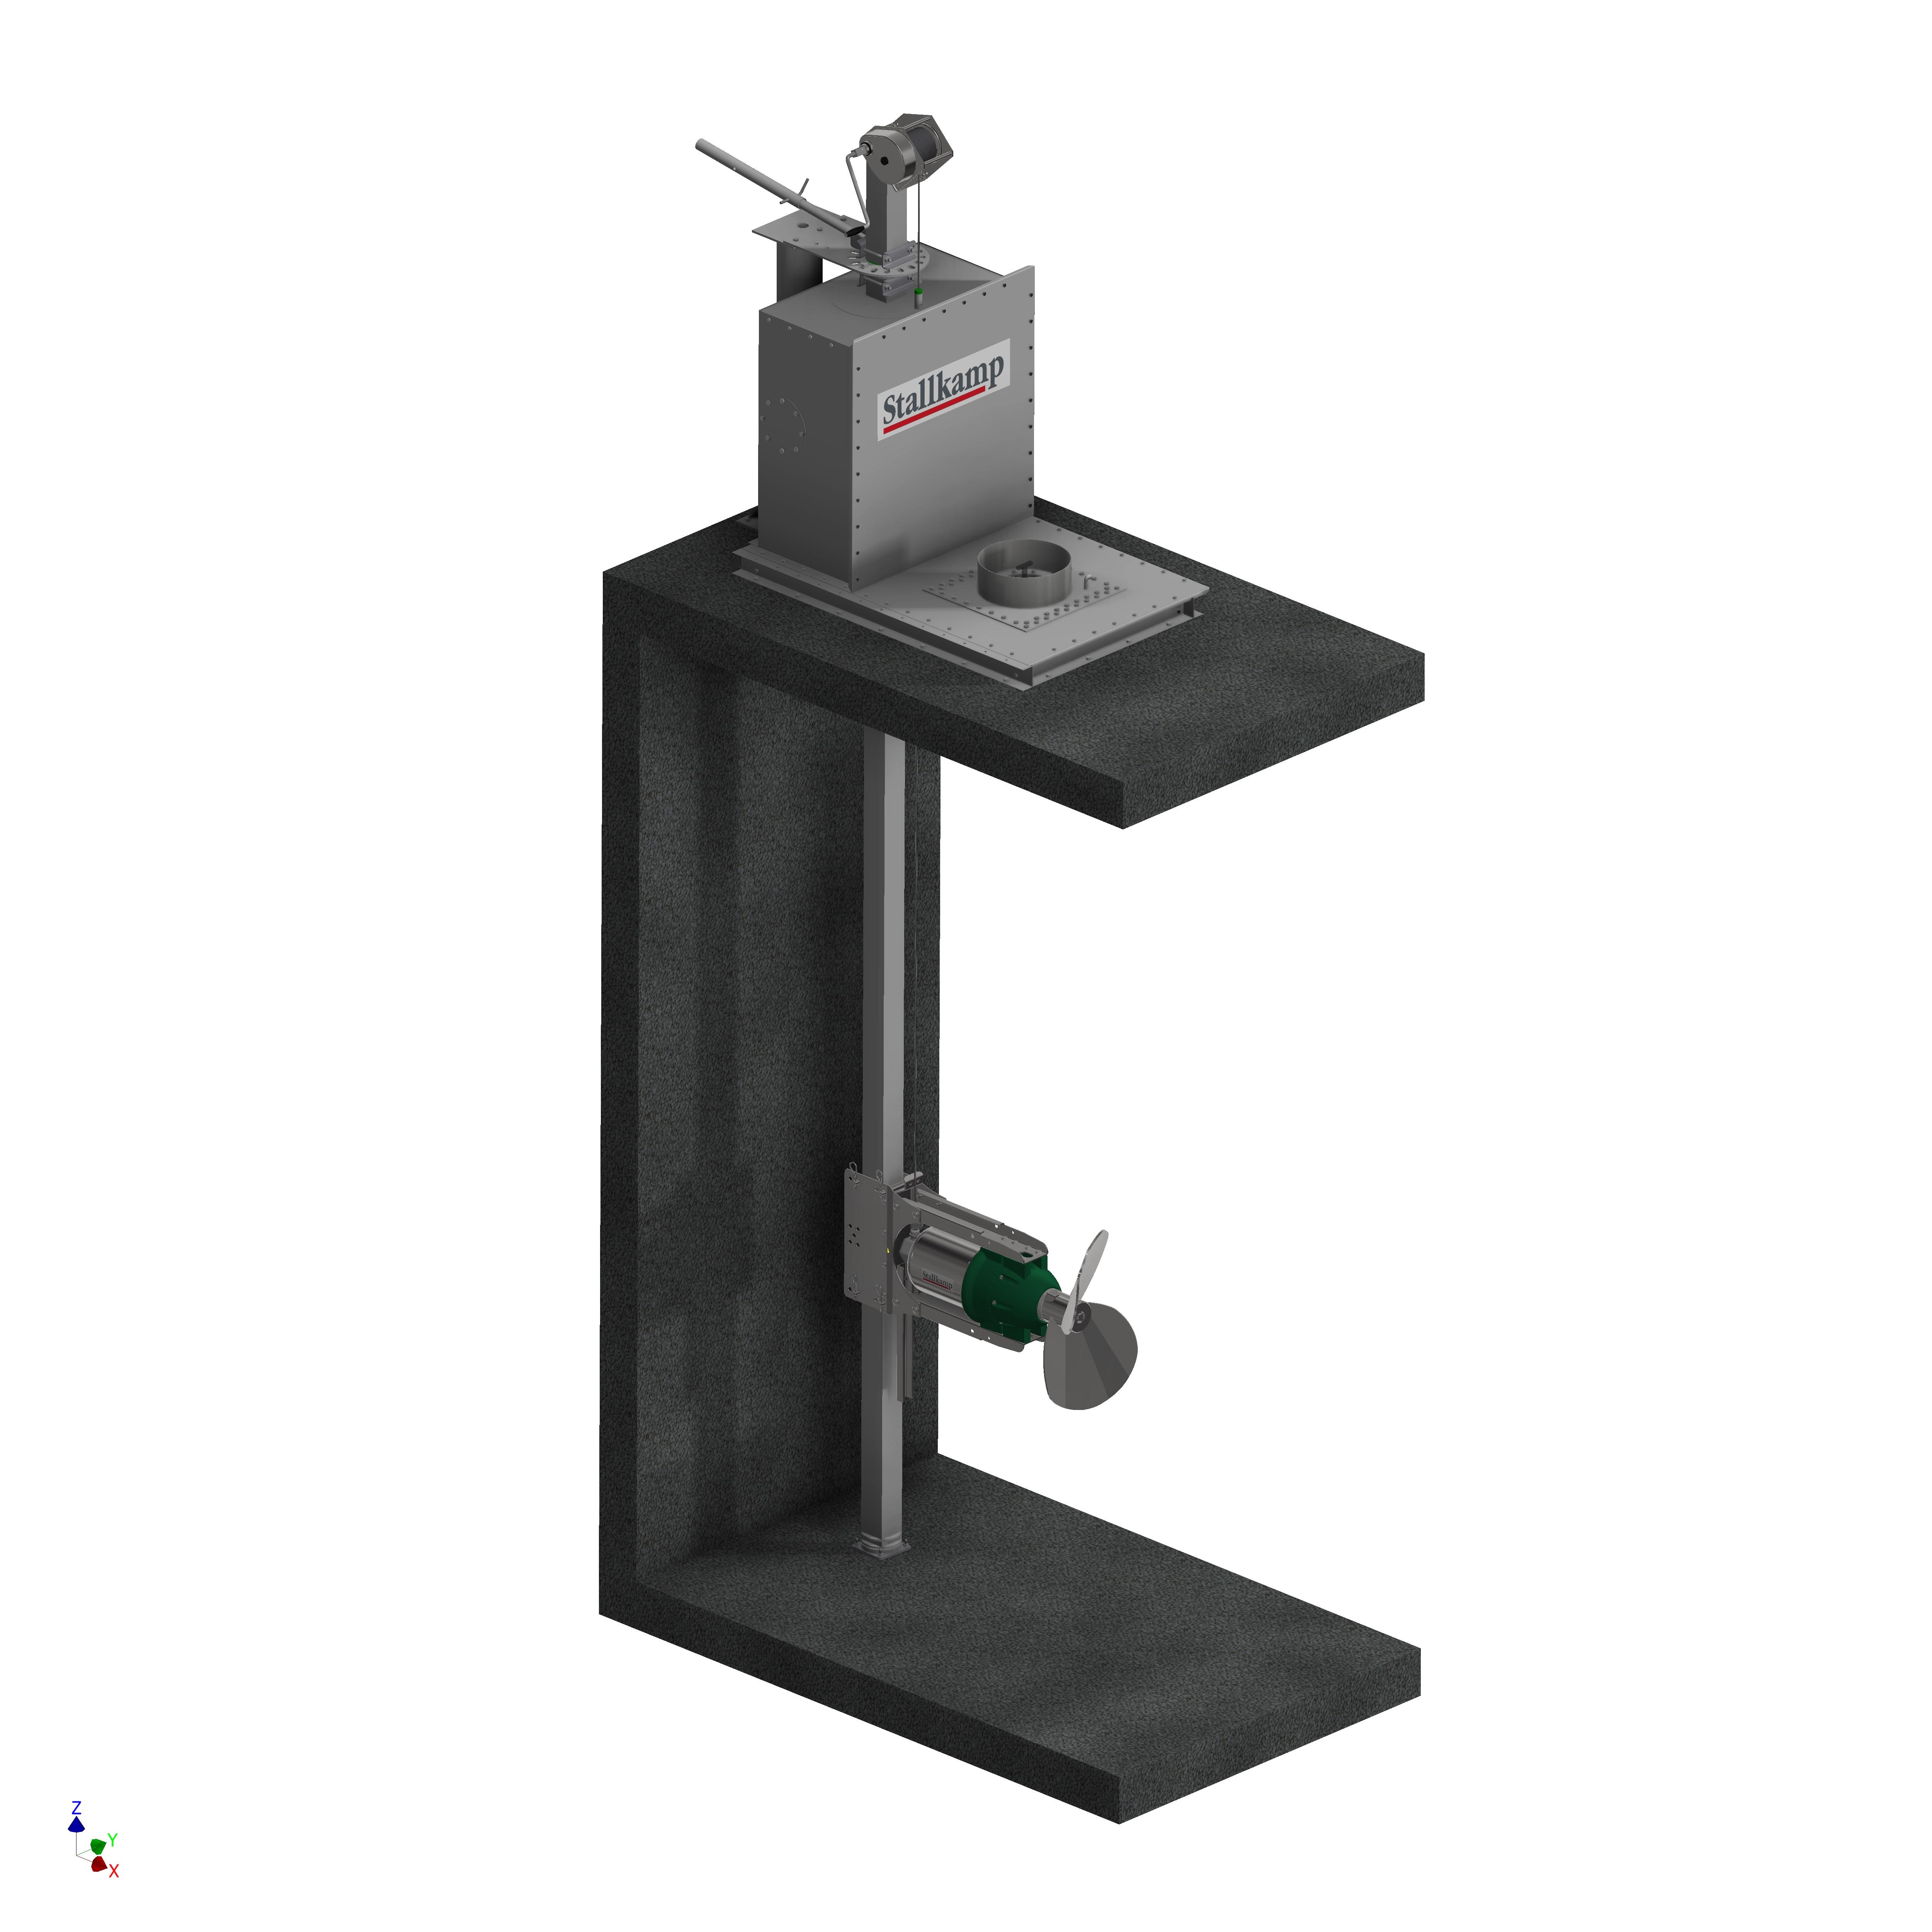 Stallkamp submersible motor agitator, mixer - Erich